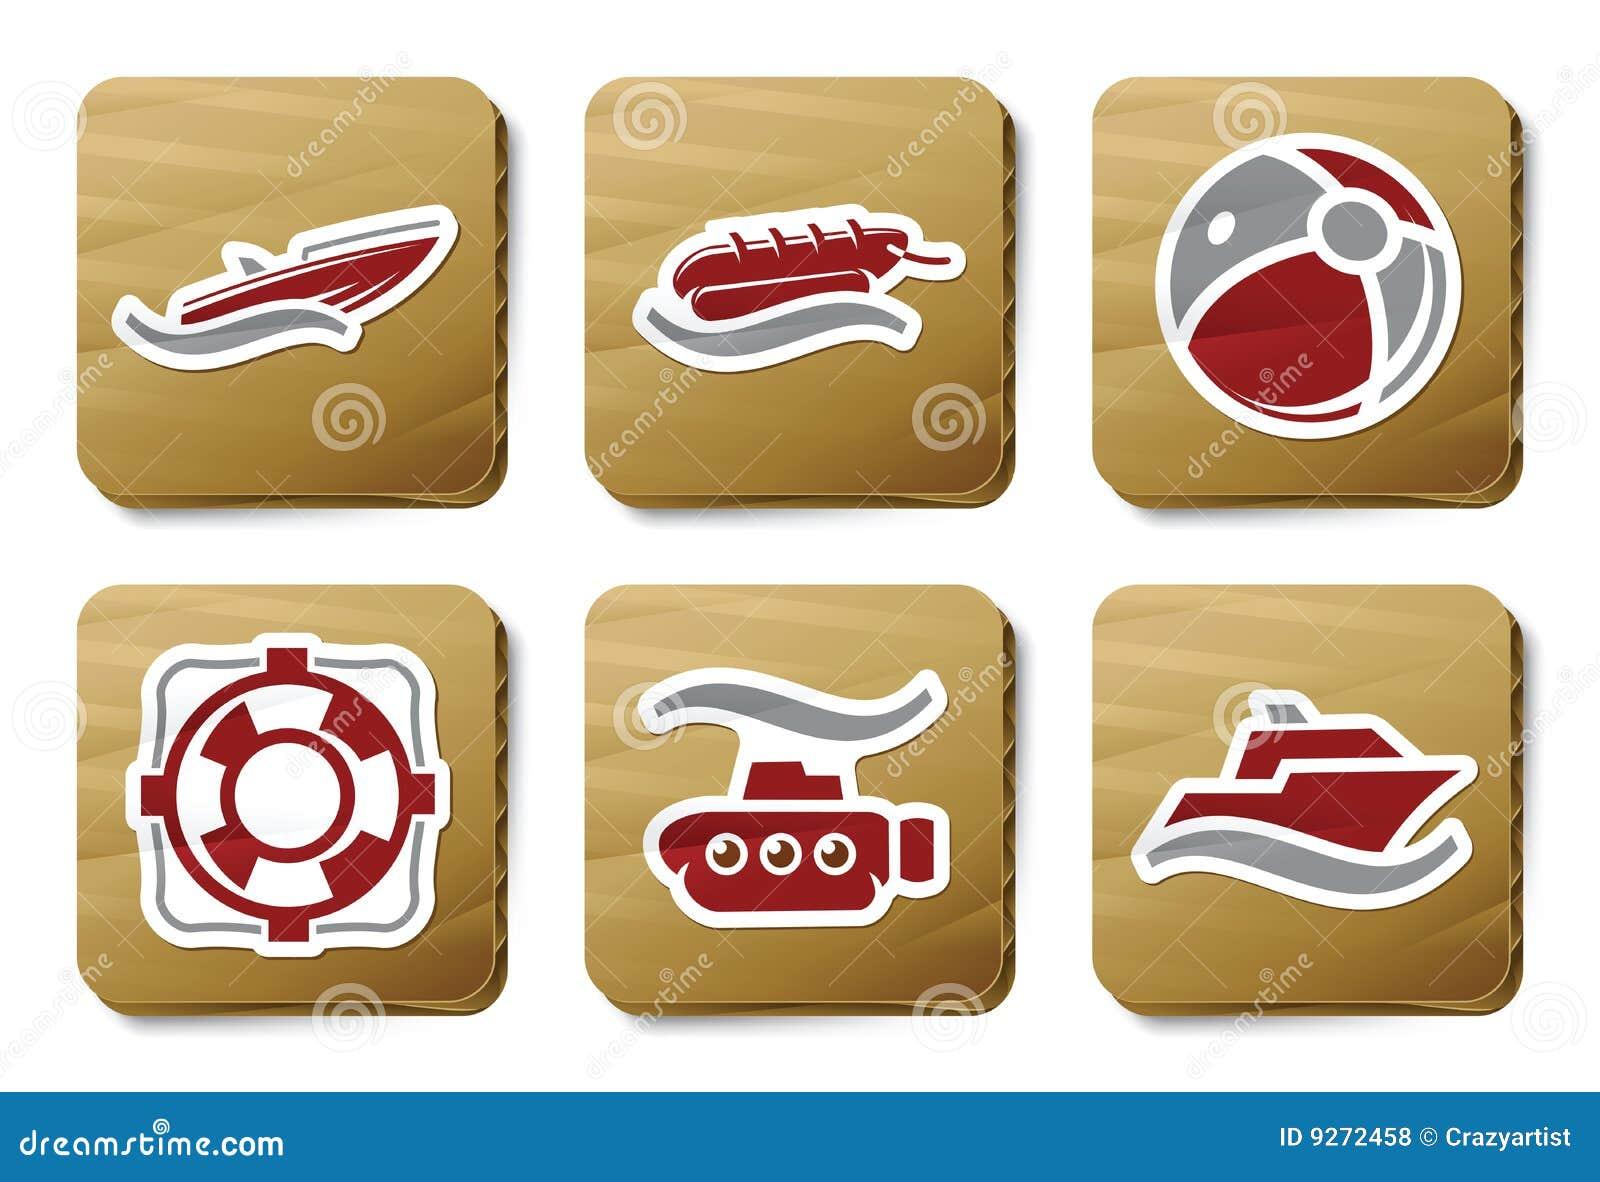 Sea and Beach icons | Cardboard series